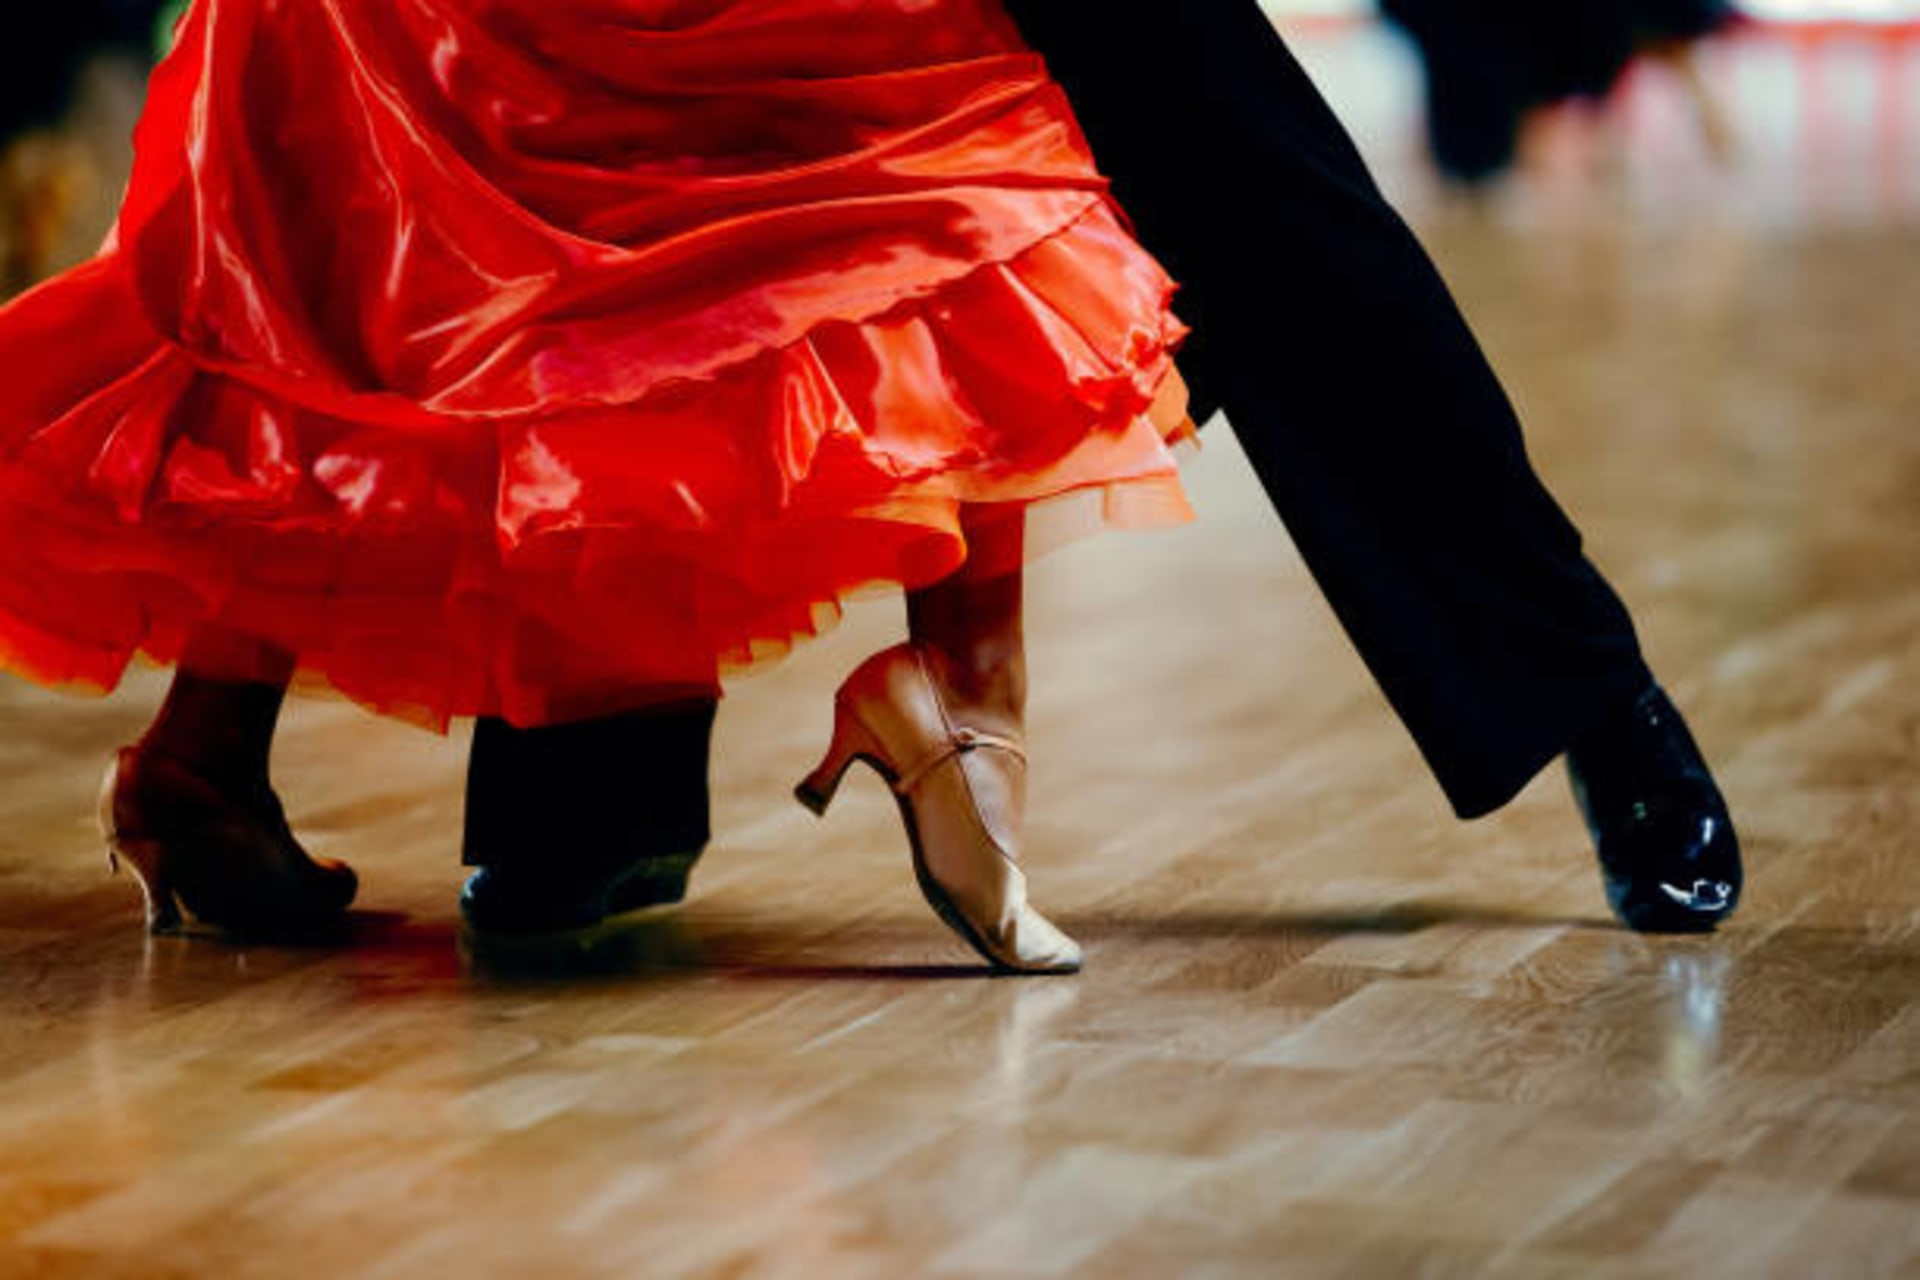 Korcula - An Evening of Latin American Dance Styles